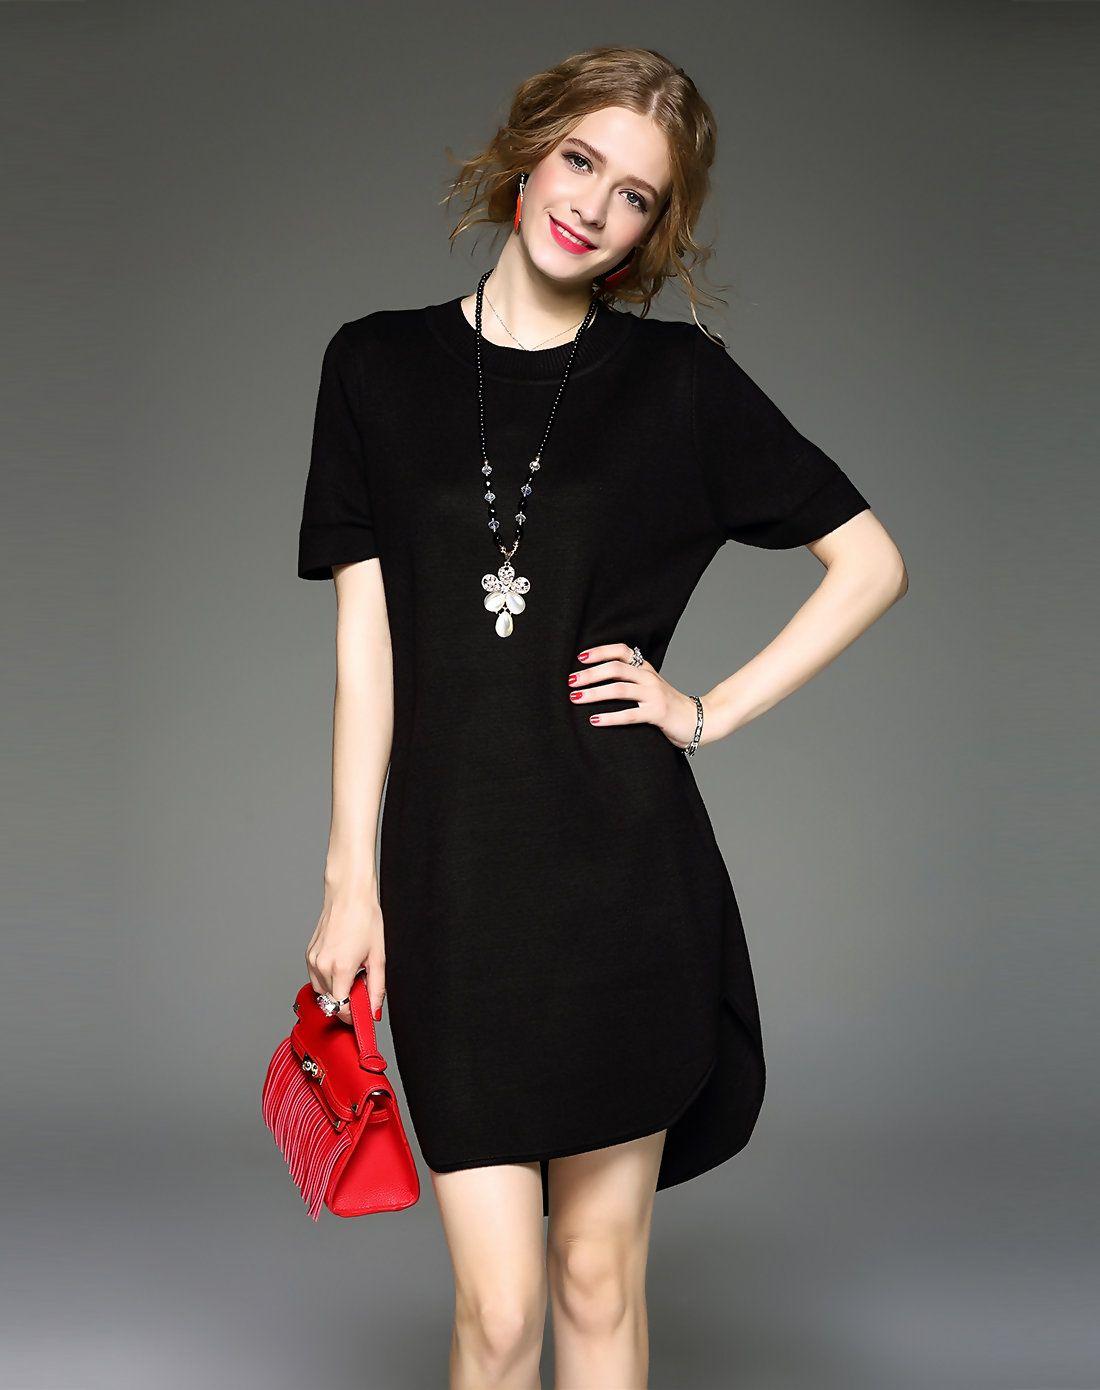 Adorewe vipme shift dresses qeexi black short sleeve asymmetrical